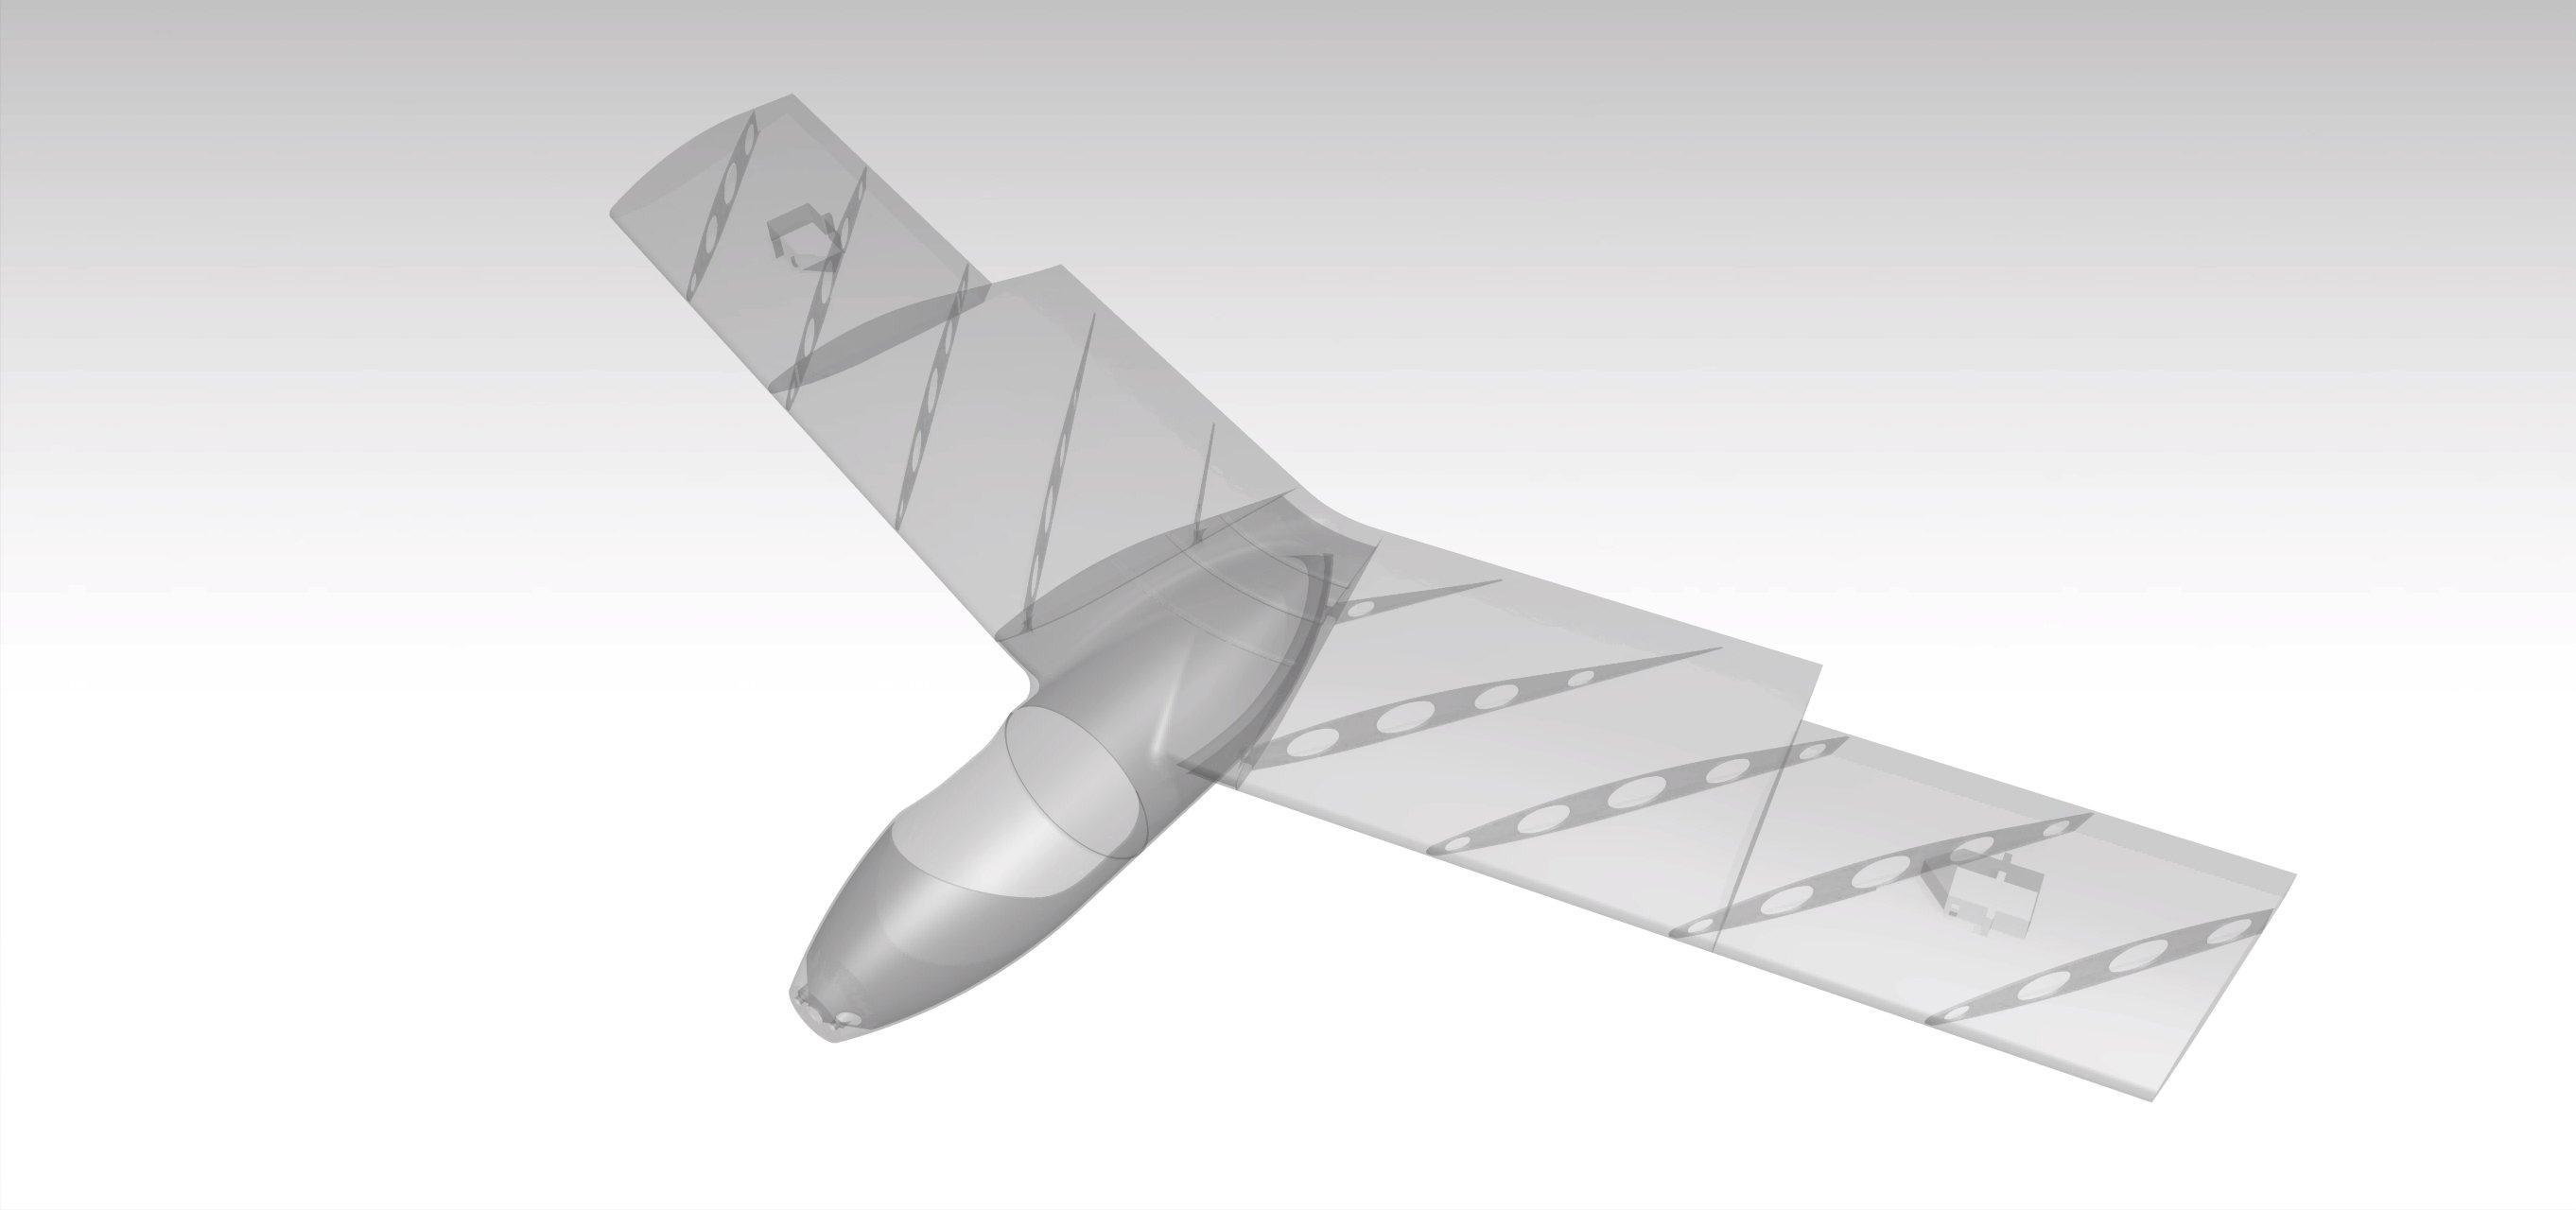 3D Printed Flying Wing | Flite Test